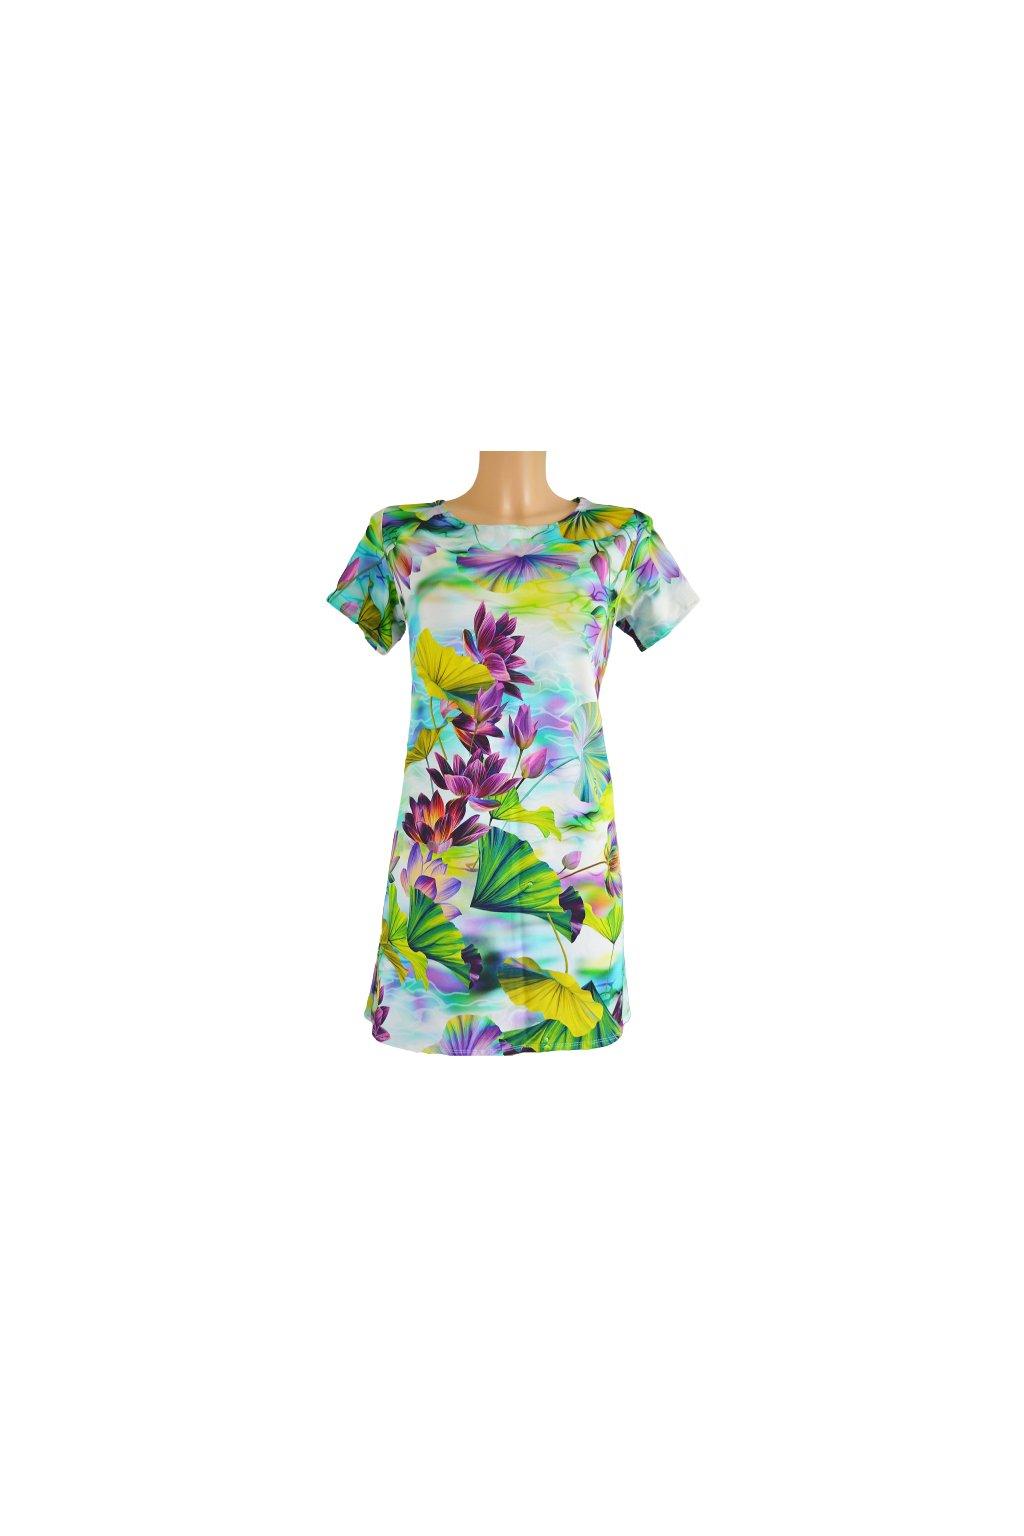 Šaty Leona -  3D tisk